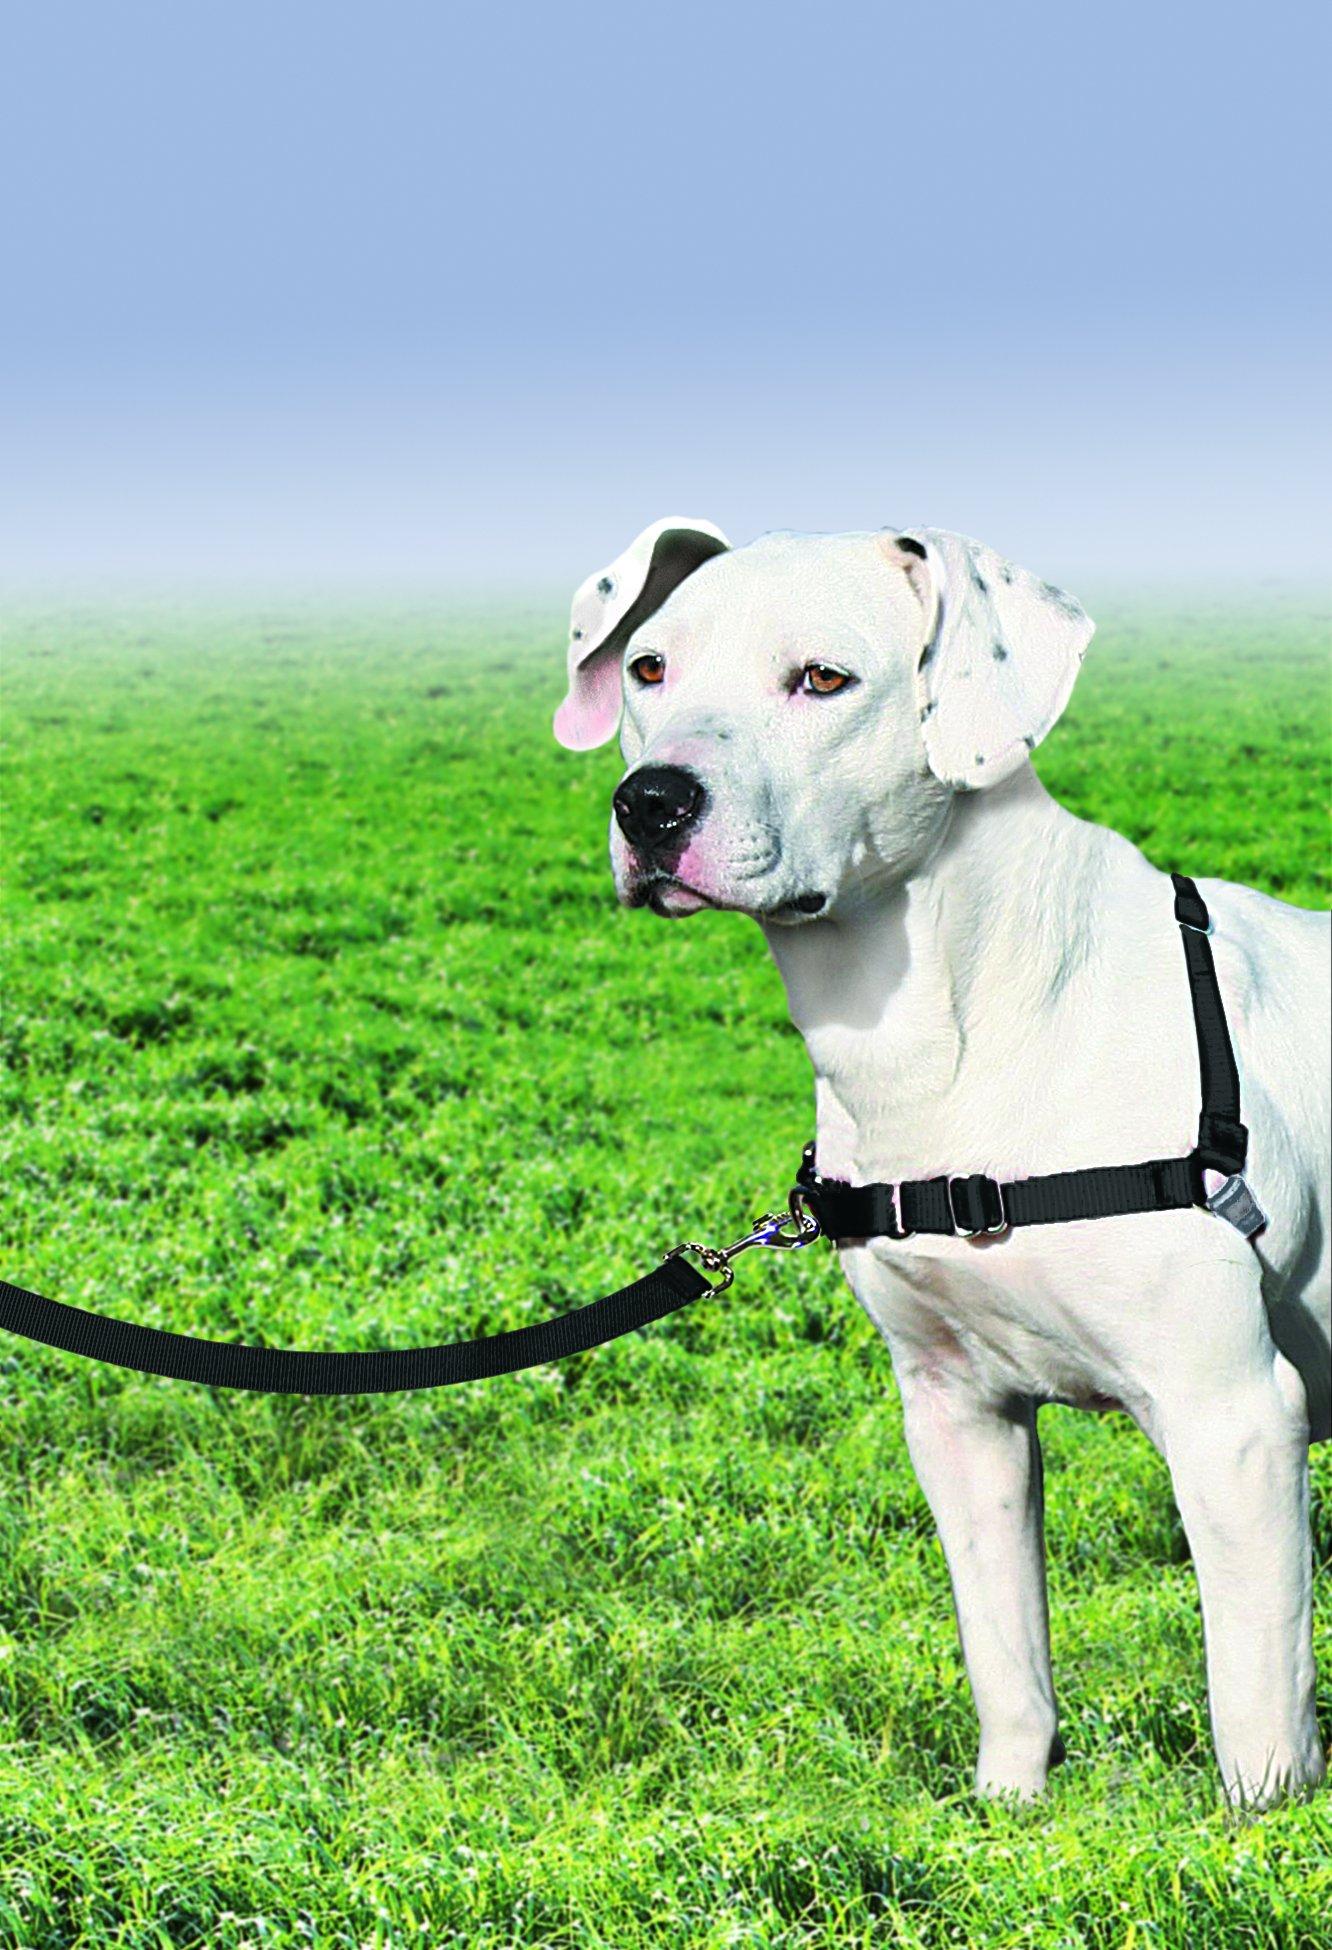 PetSafe Easy Walk Harness, Medium/Large, BLACK/SILVER for Dogs by PetSafe (Image #3)